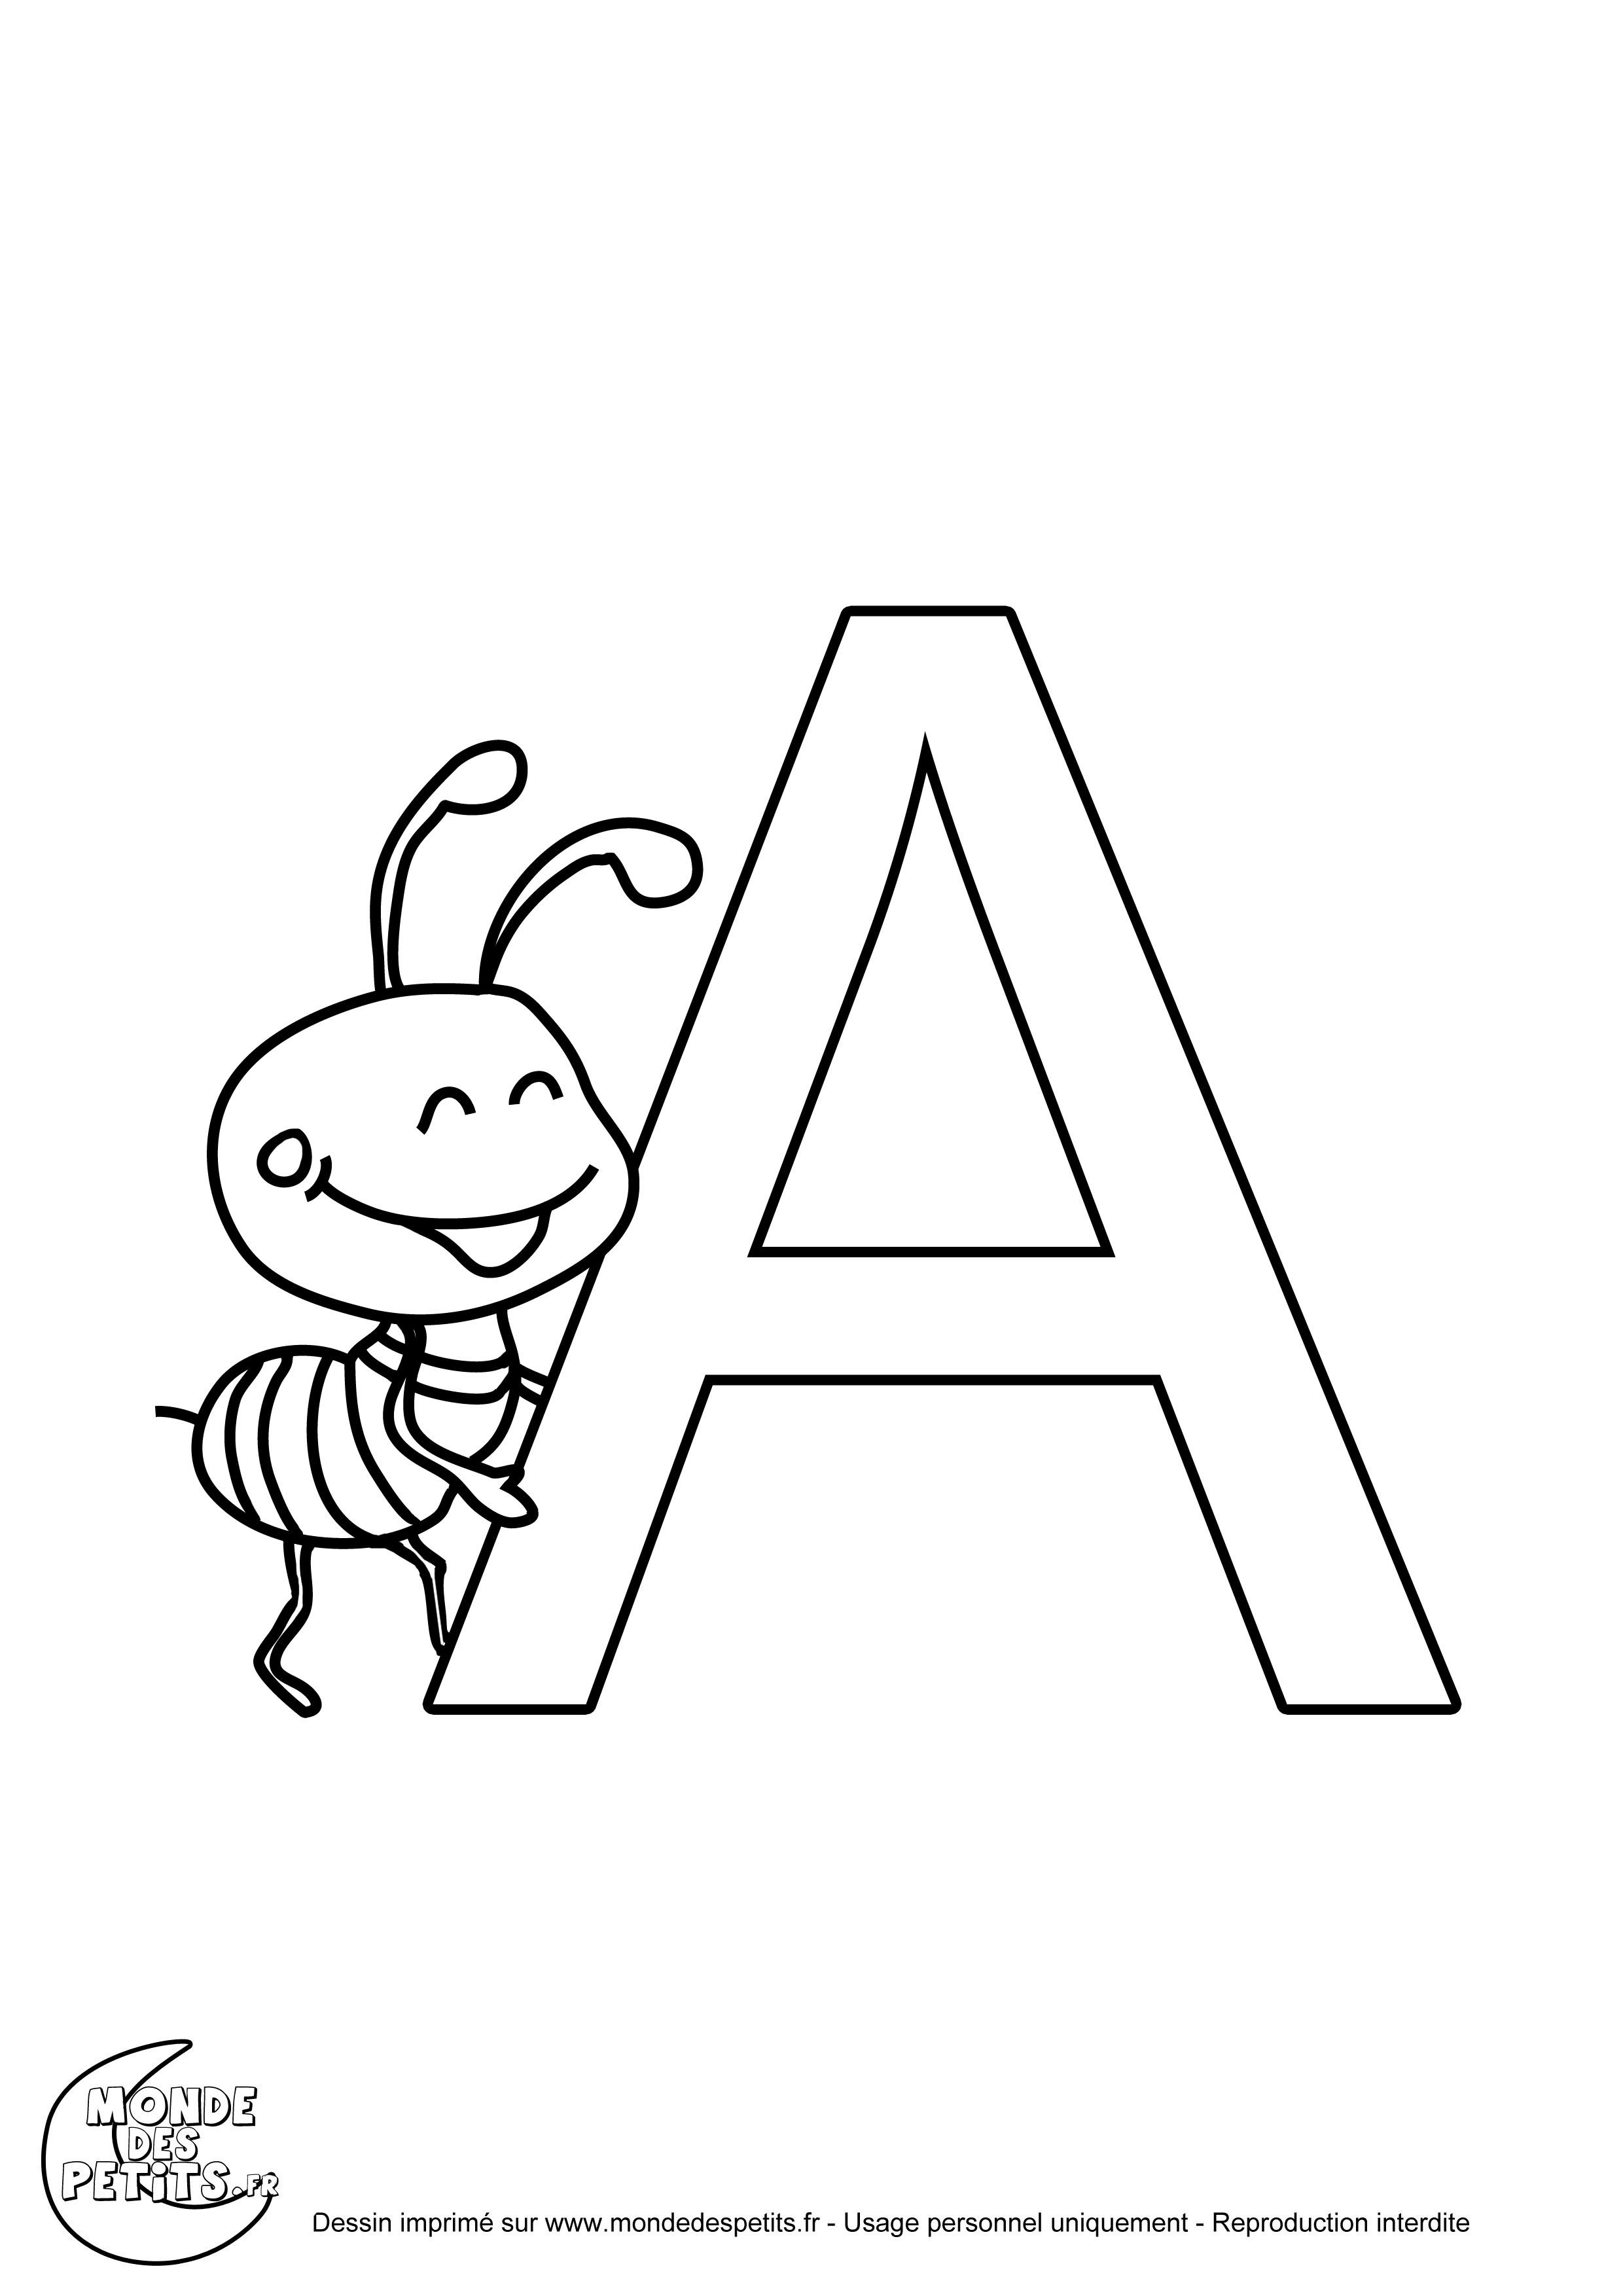 http://www.mondedespetits.fr/images/coloriage-alphabet ...